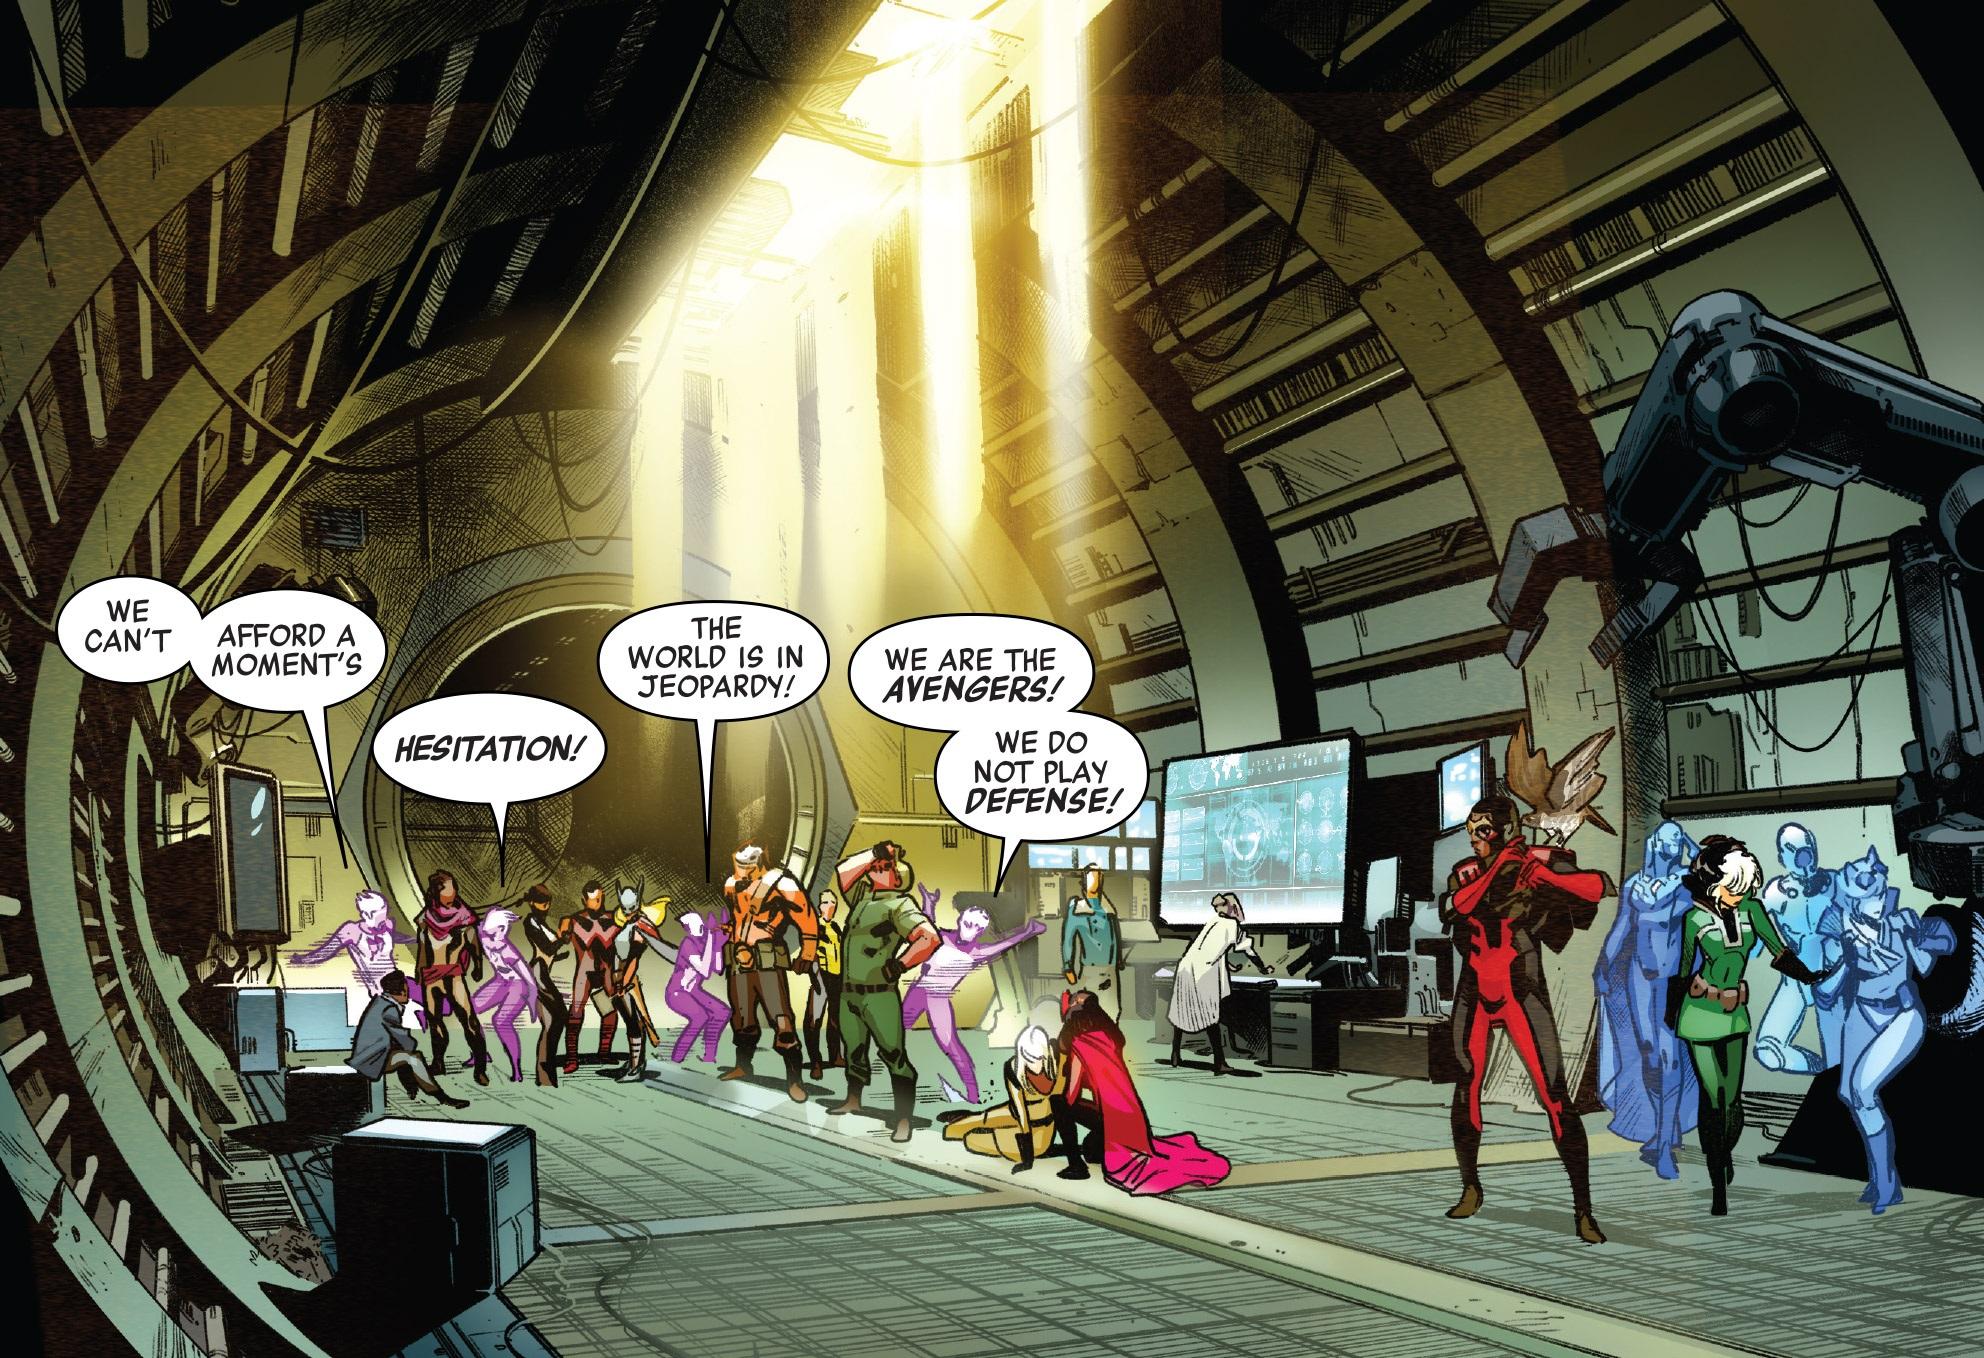 Avengers Auxiliary Headquarters